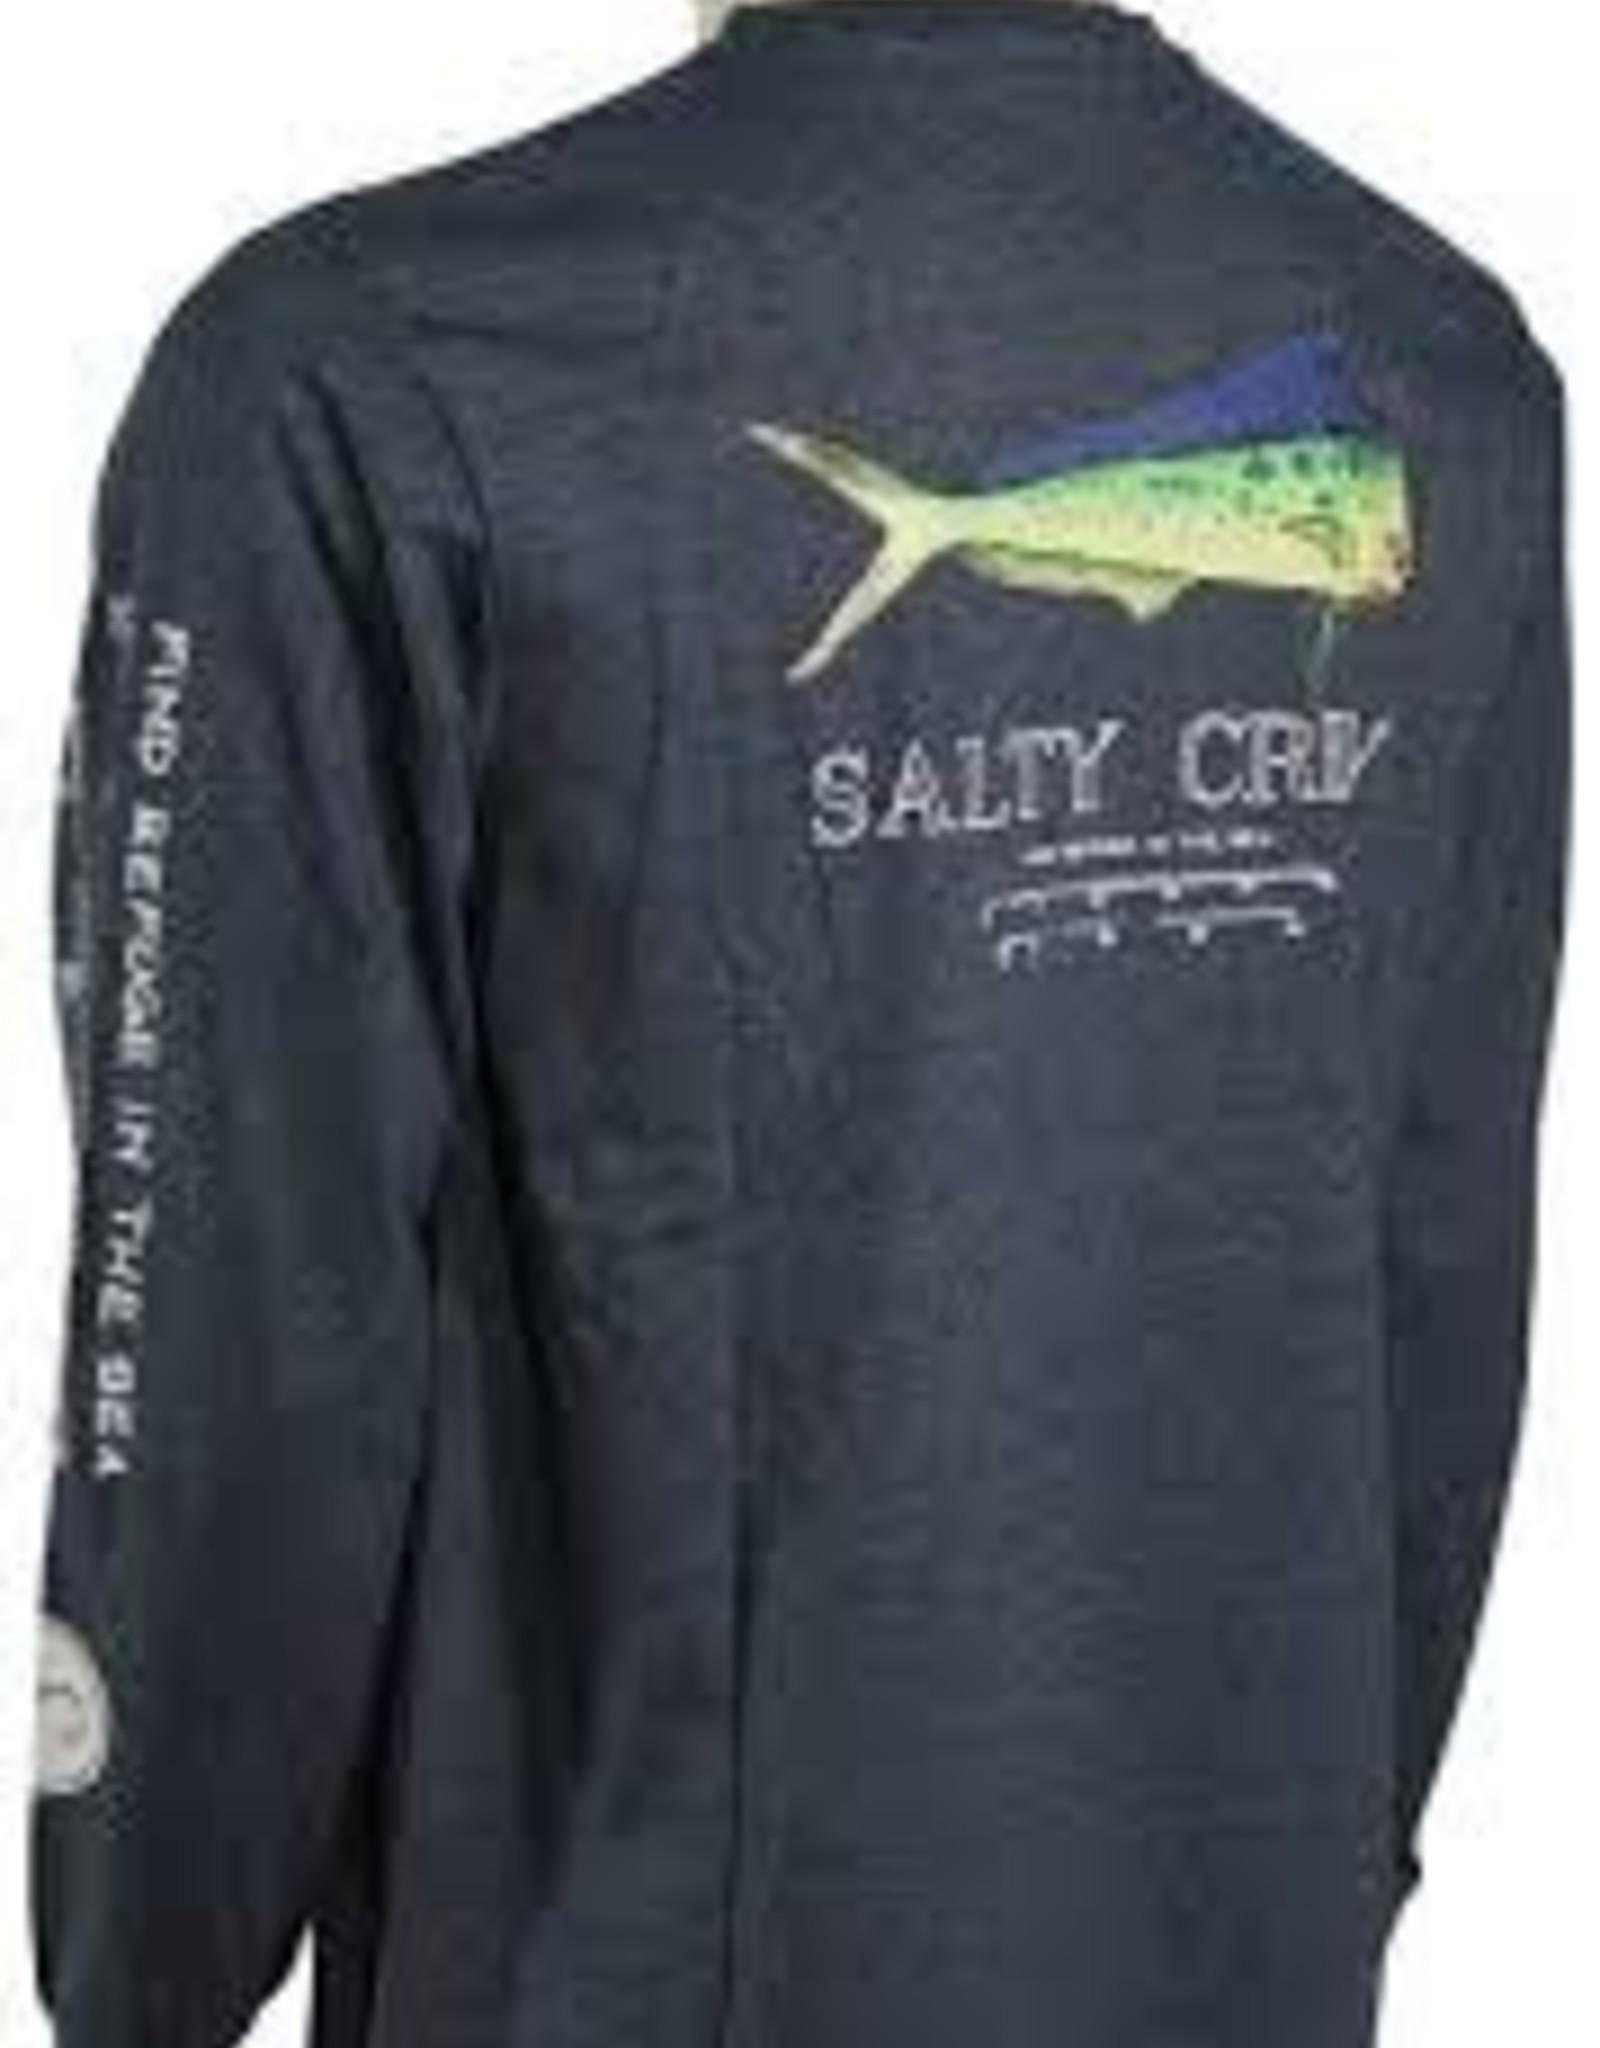 salty crew Salty Crew Angry Bull L/S tech Tee 20135024